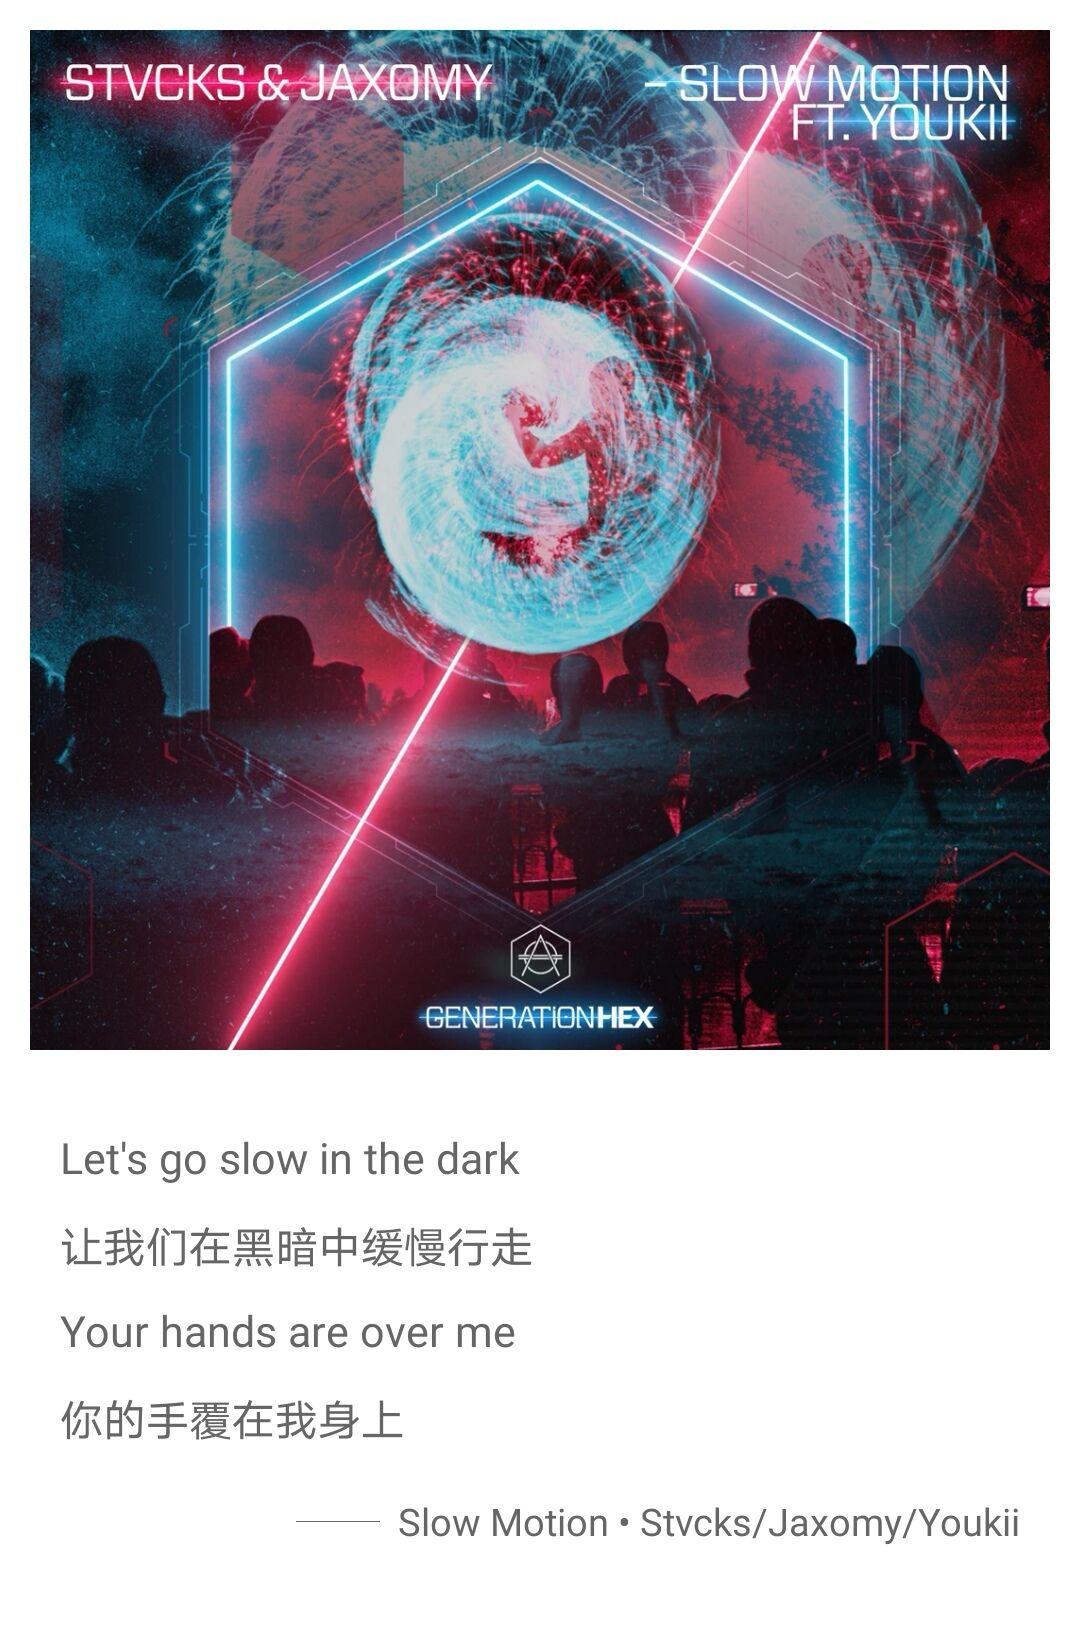 『单曲推荐』Slow Motion/Stvcks